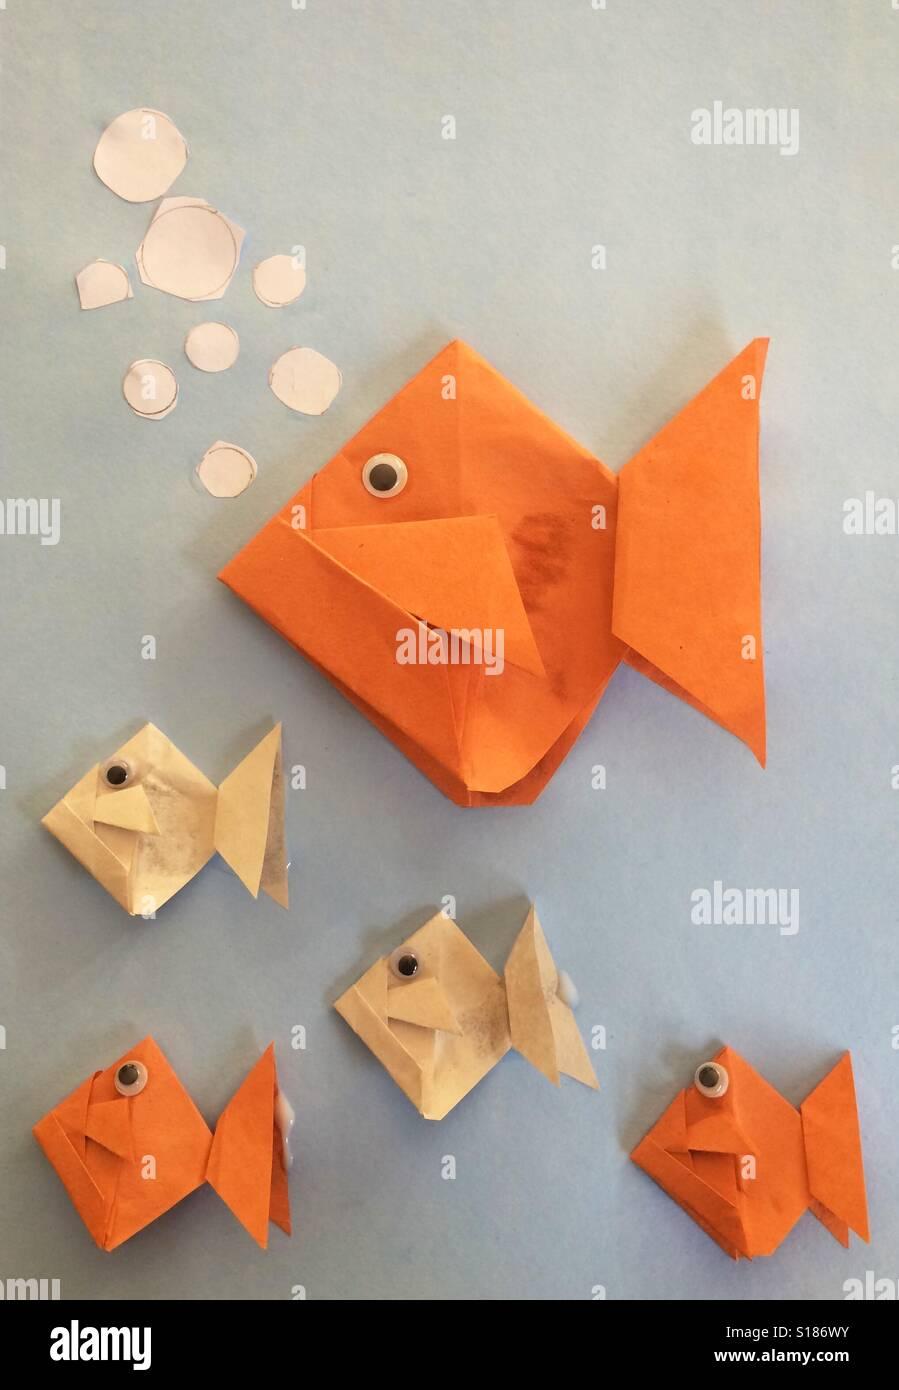 Origami Fish Stock Photos Origami Fish Stock Images Alamy